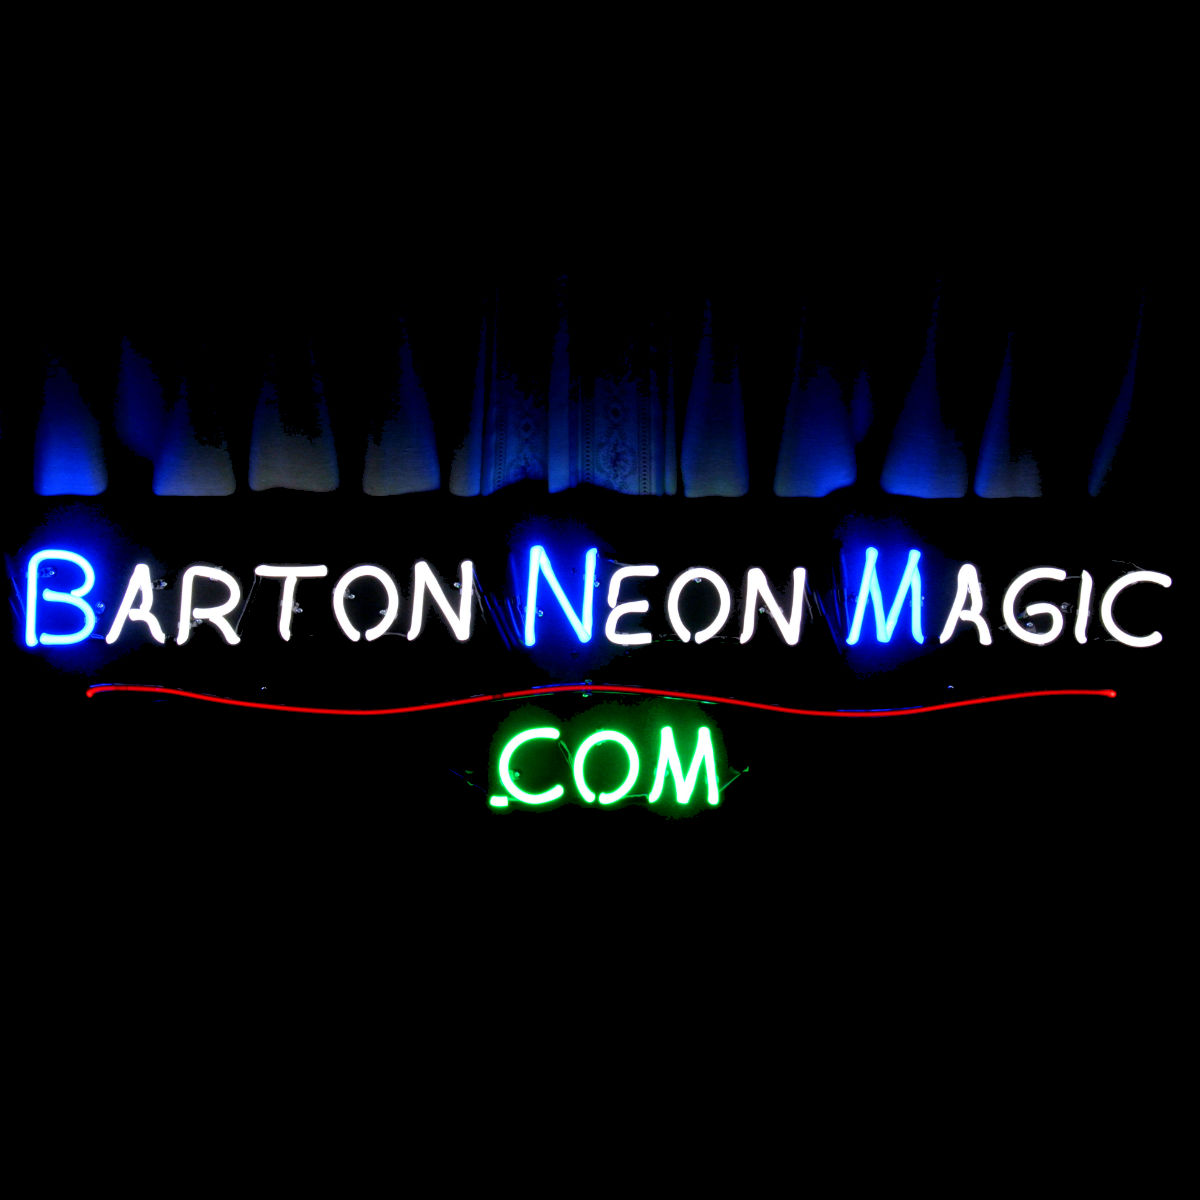 Custom Hand-blown Neon Lighting by John Barton - BartonNeonMagic.com